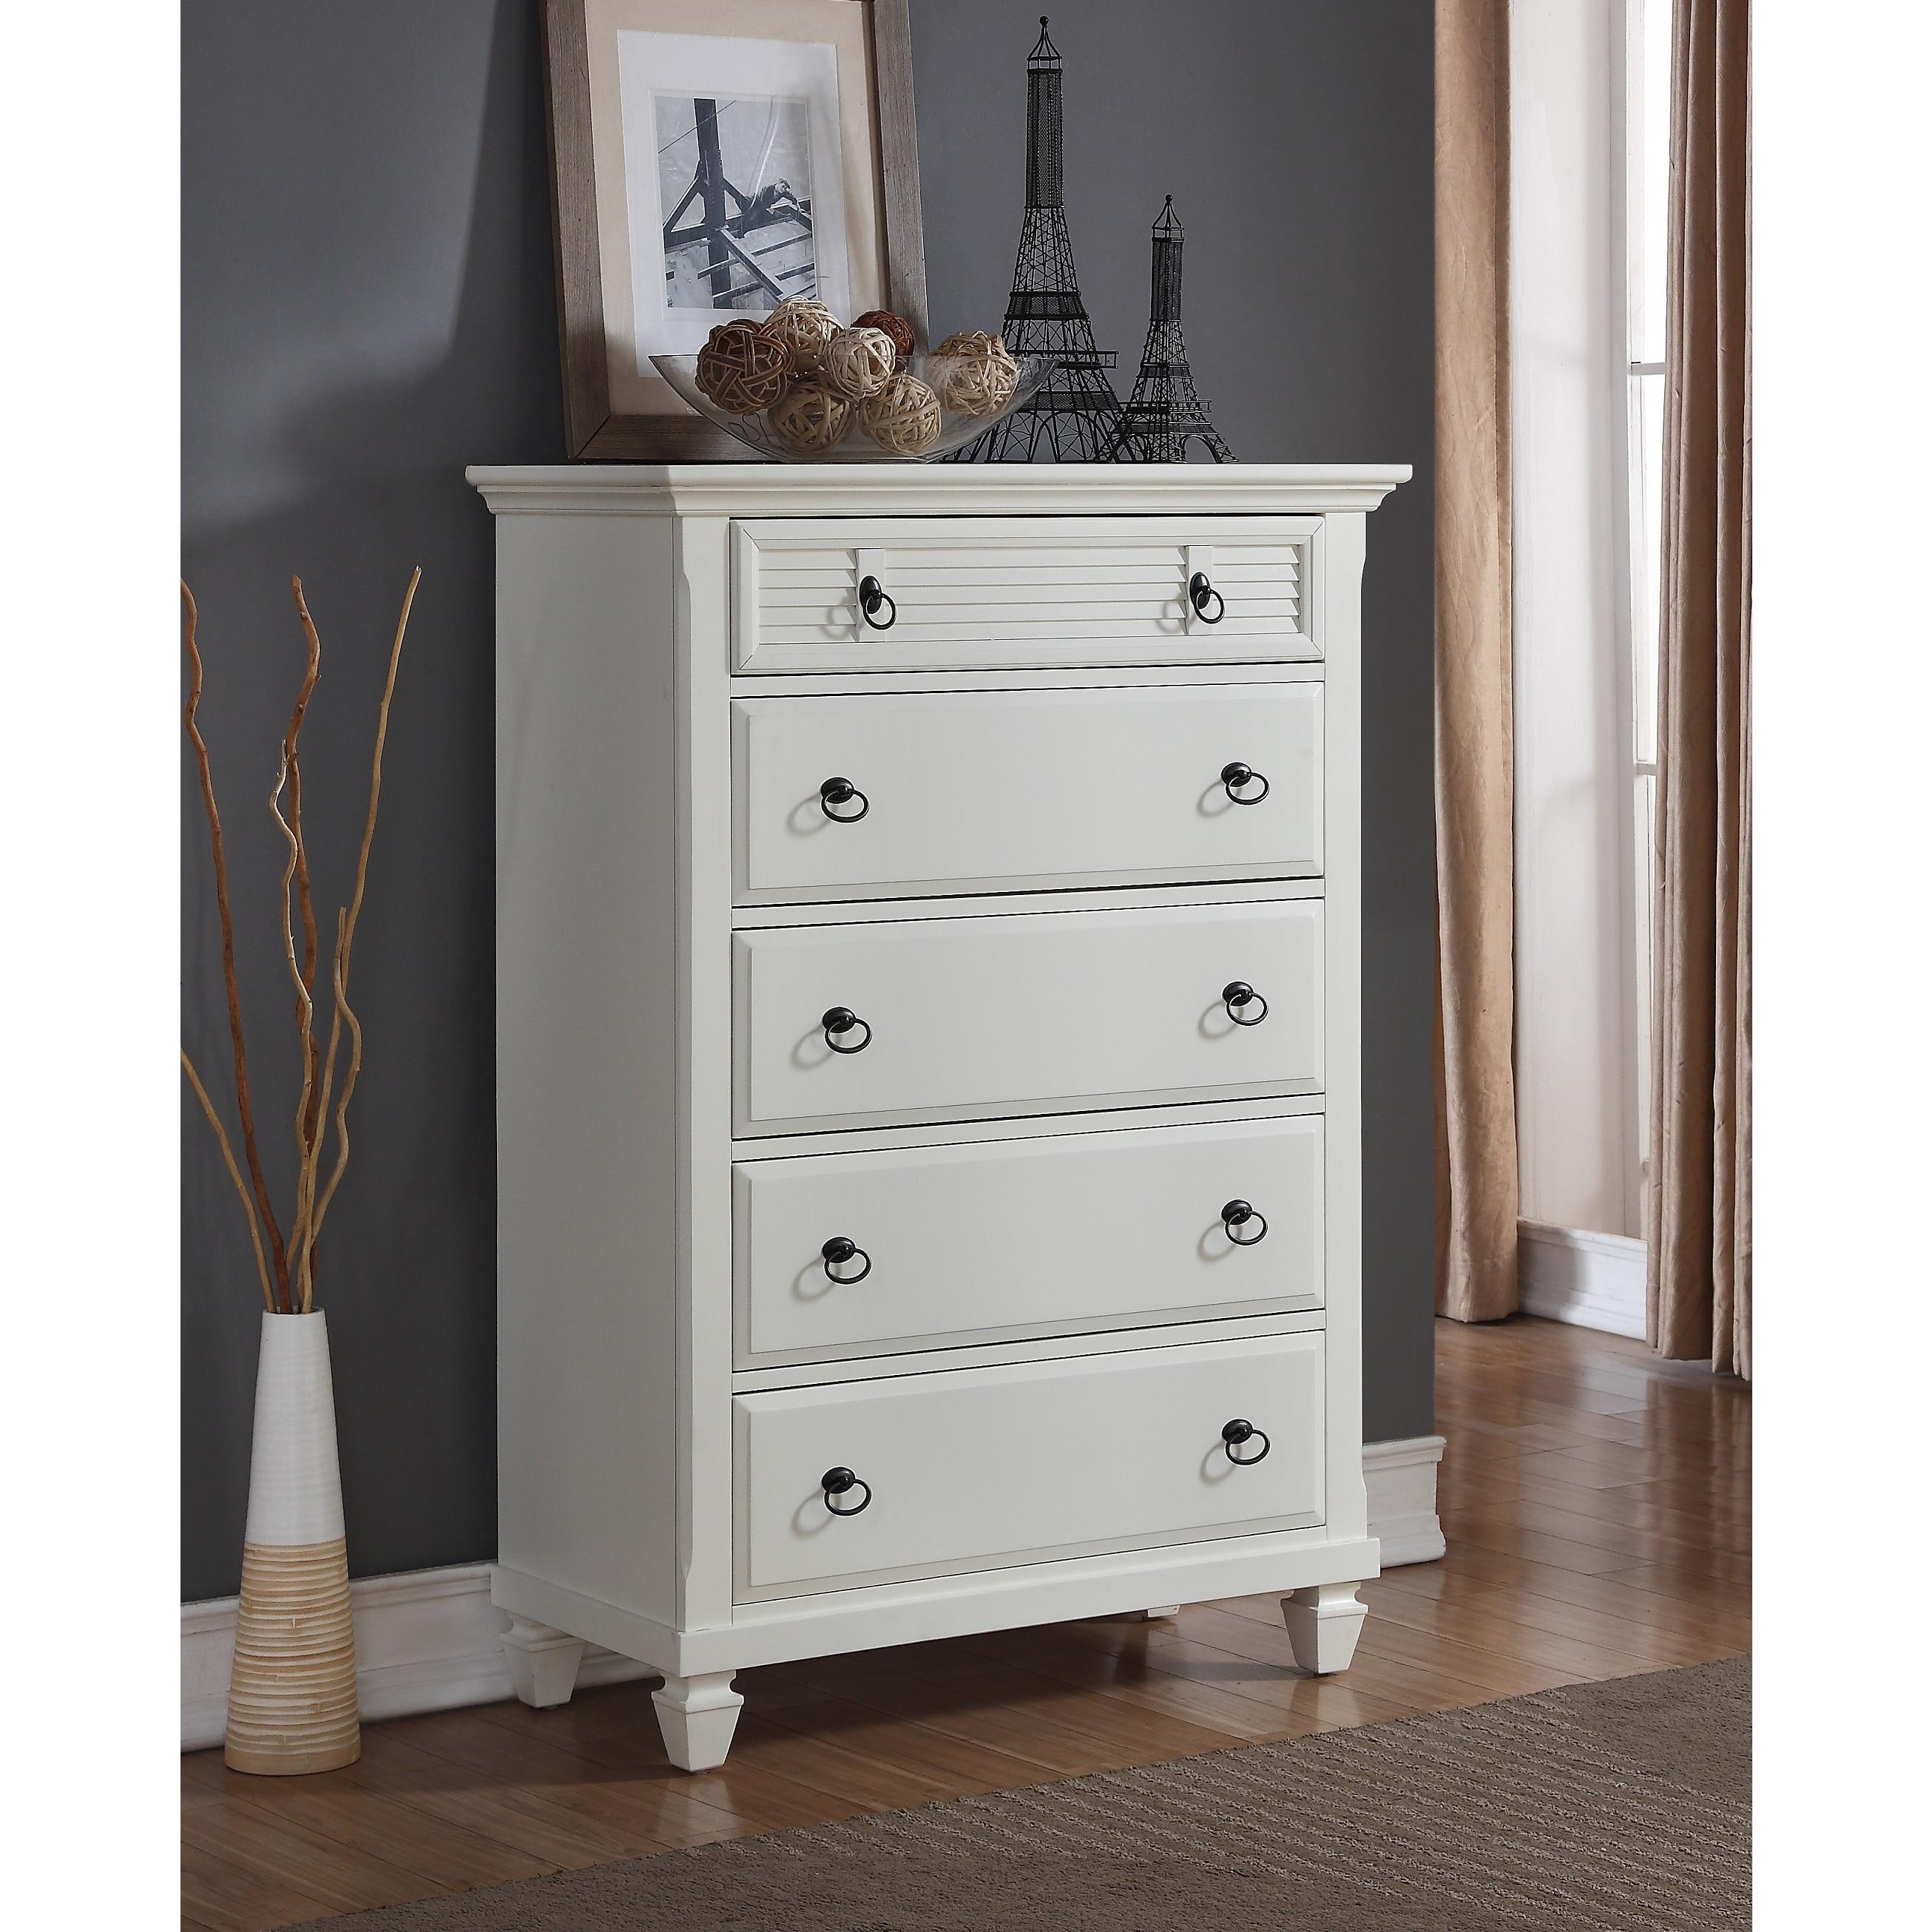 Shop Regitina 016 White Bedroom 5 Drawer Chest Overstock 12594371